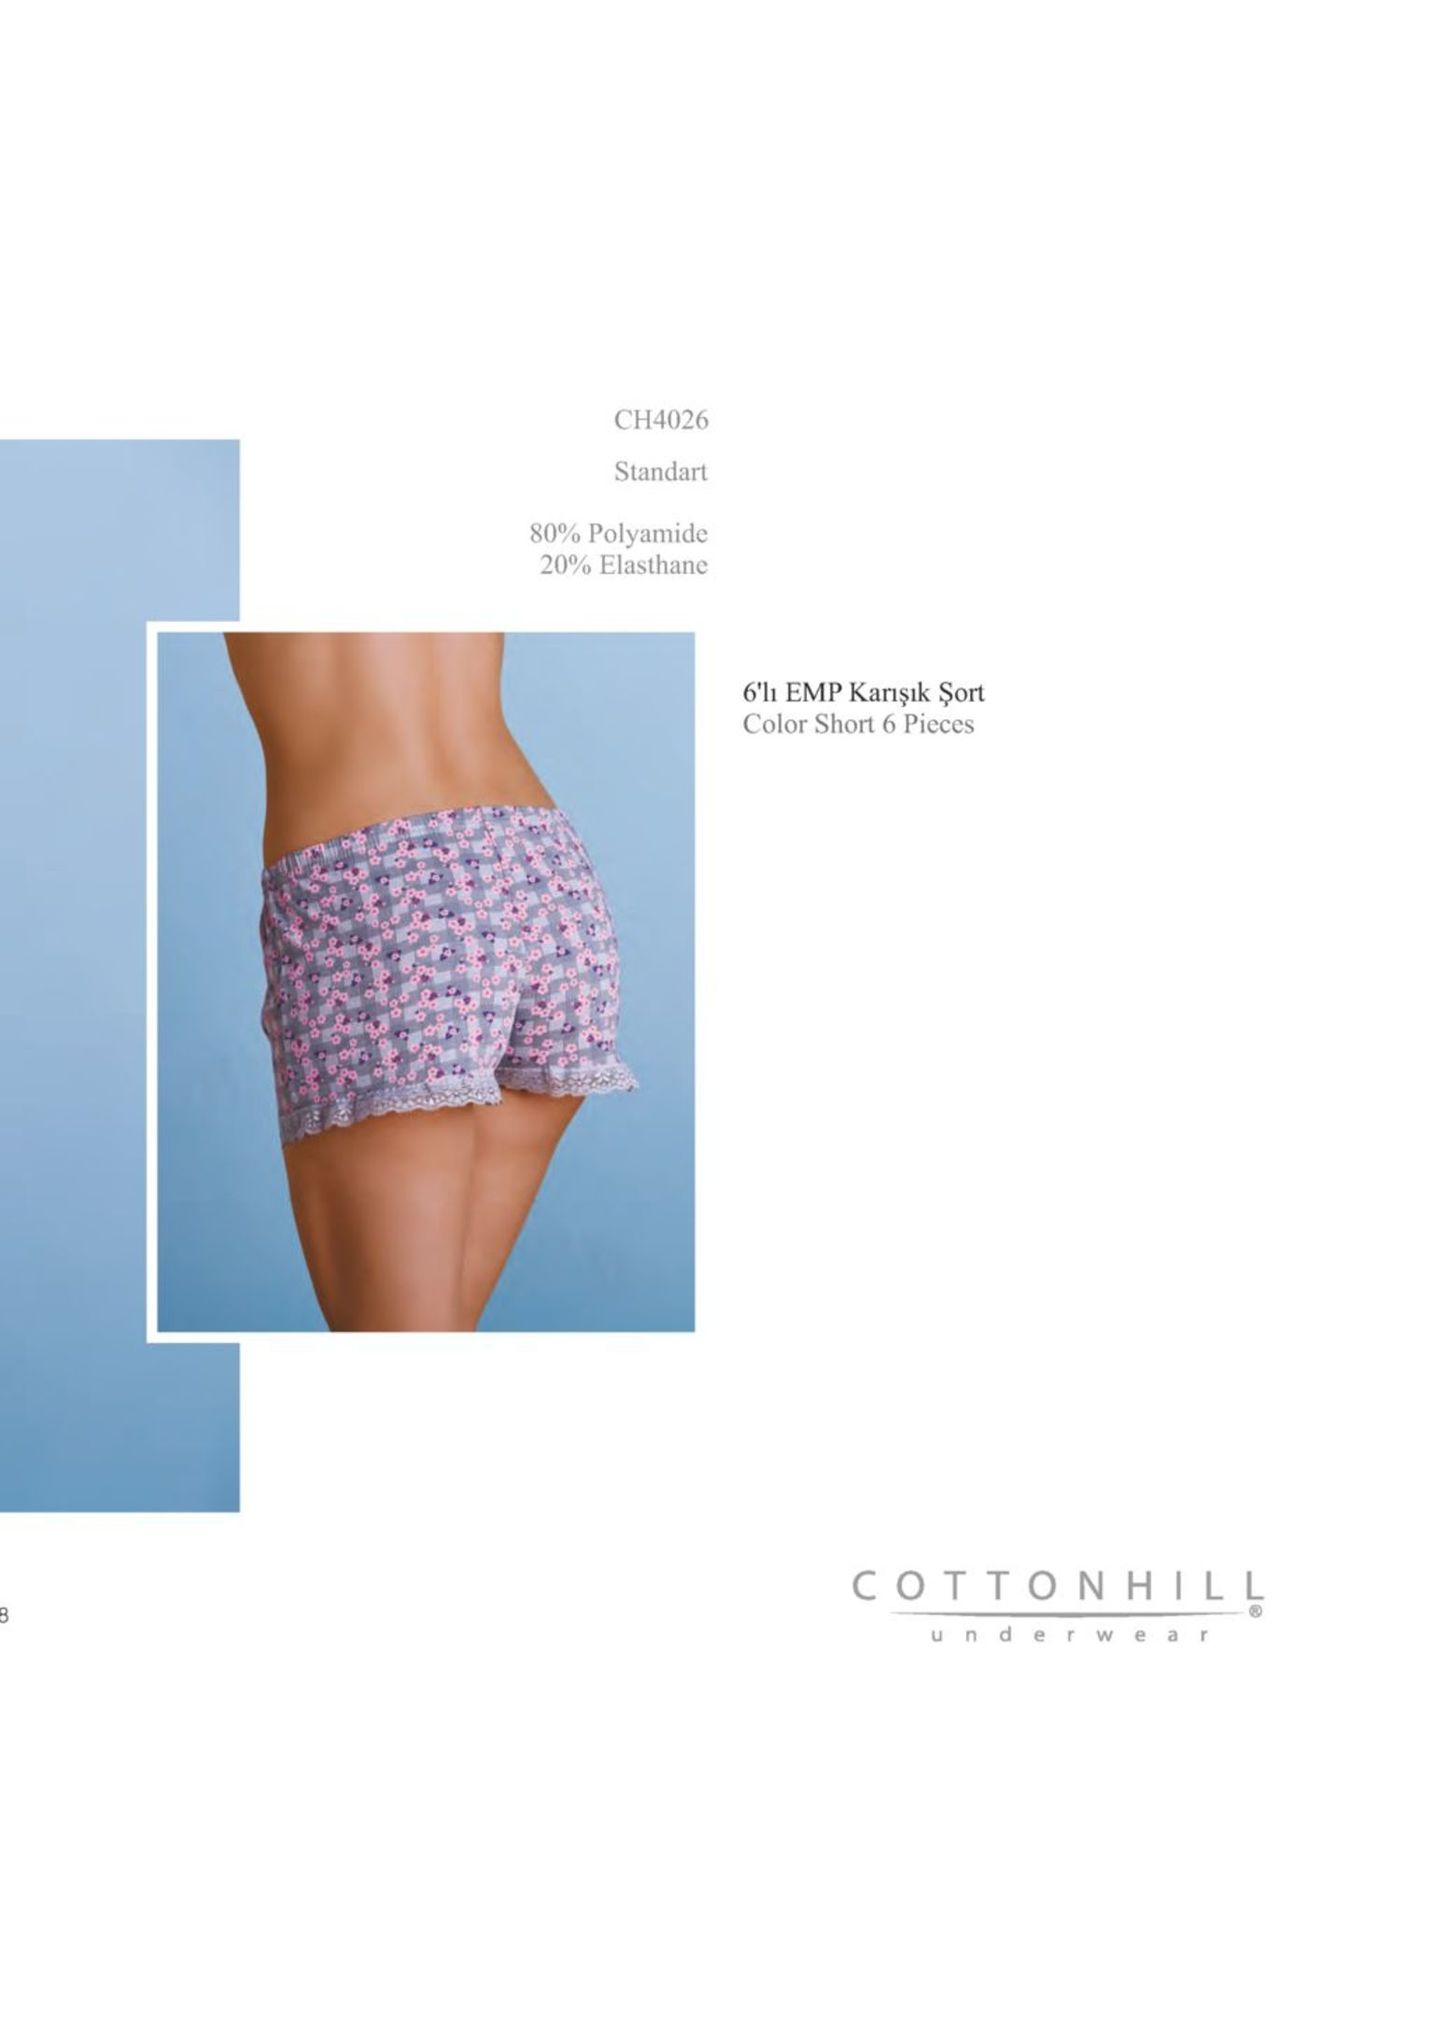 ch4026 standart 80% polyamide 20% elasthane 6' emp karışık şort color short 6 pieces cottonhill under w ea r